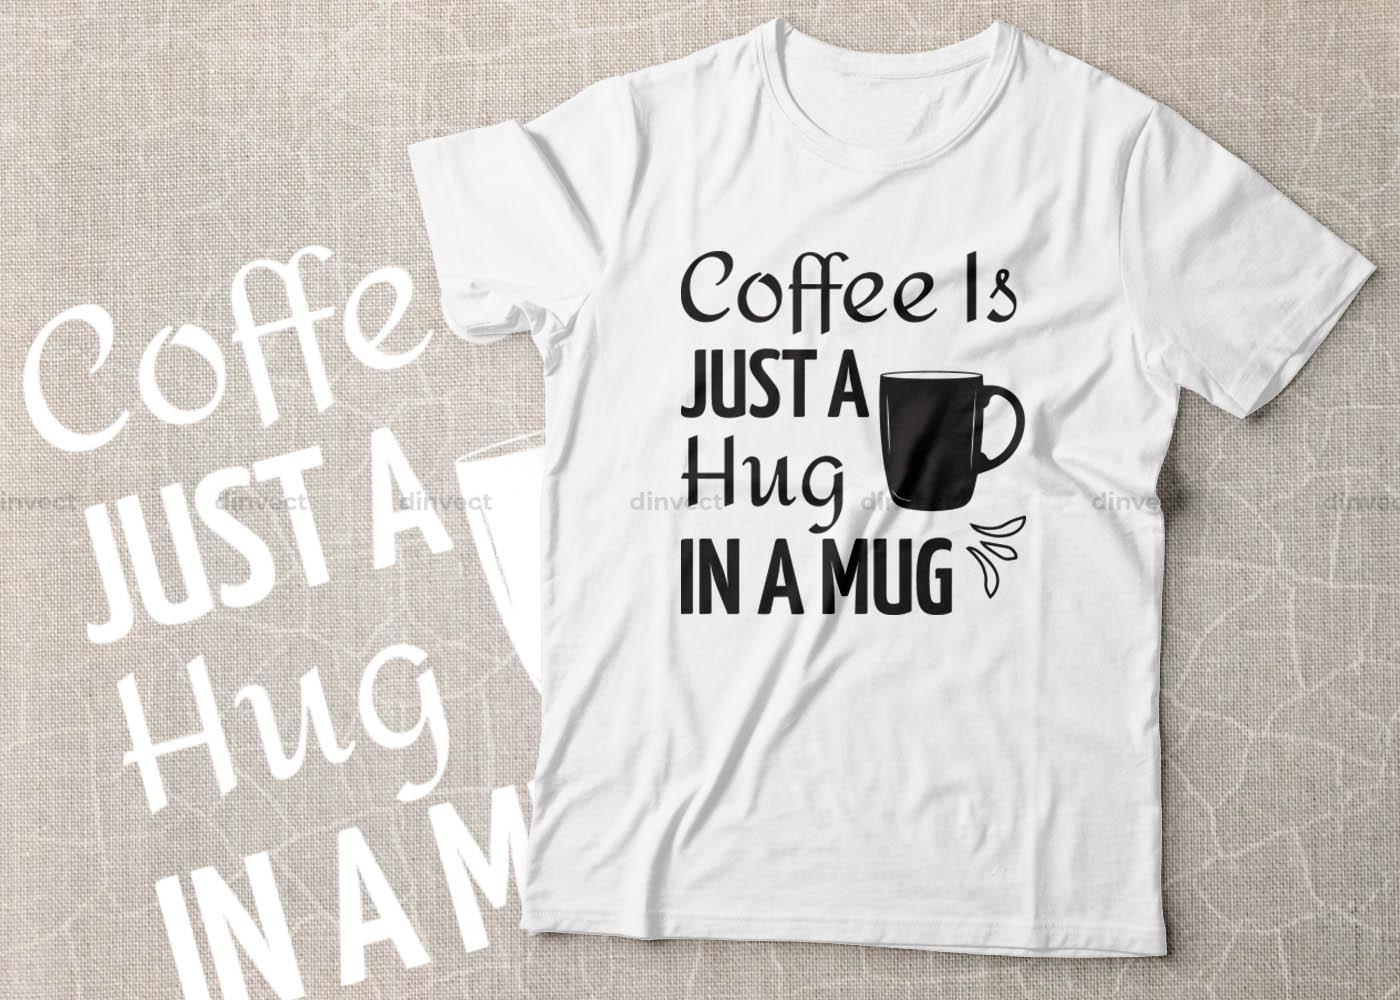 Coffee SVG, Coffee Bundle Svg, Coffee Mug Svg, Funny Coffee Quotes SVG, Mug Design Svg, Coffee Quote - Coffee 3 -